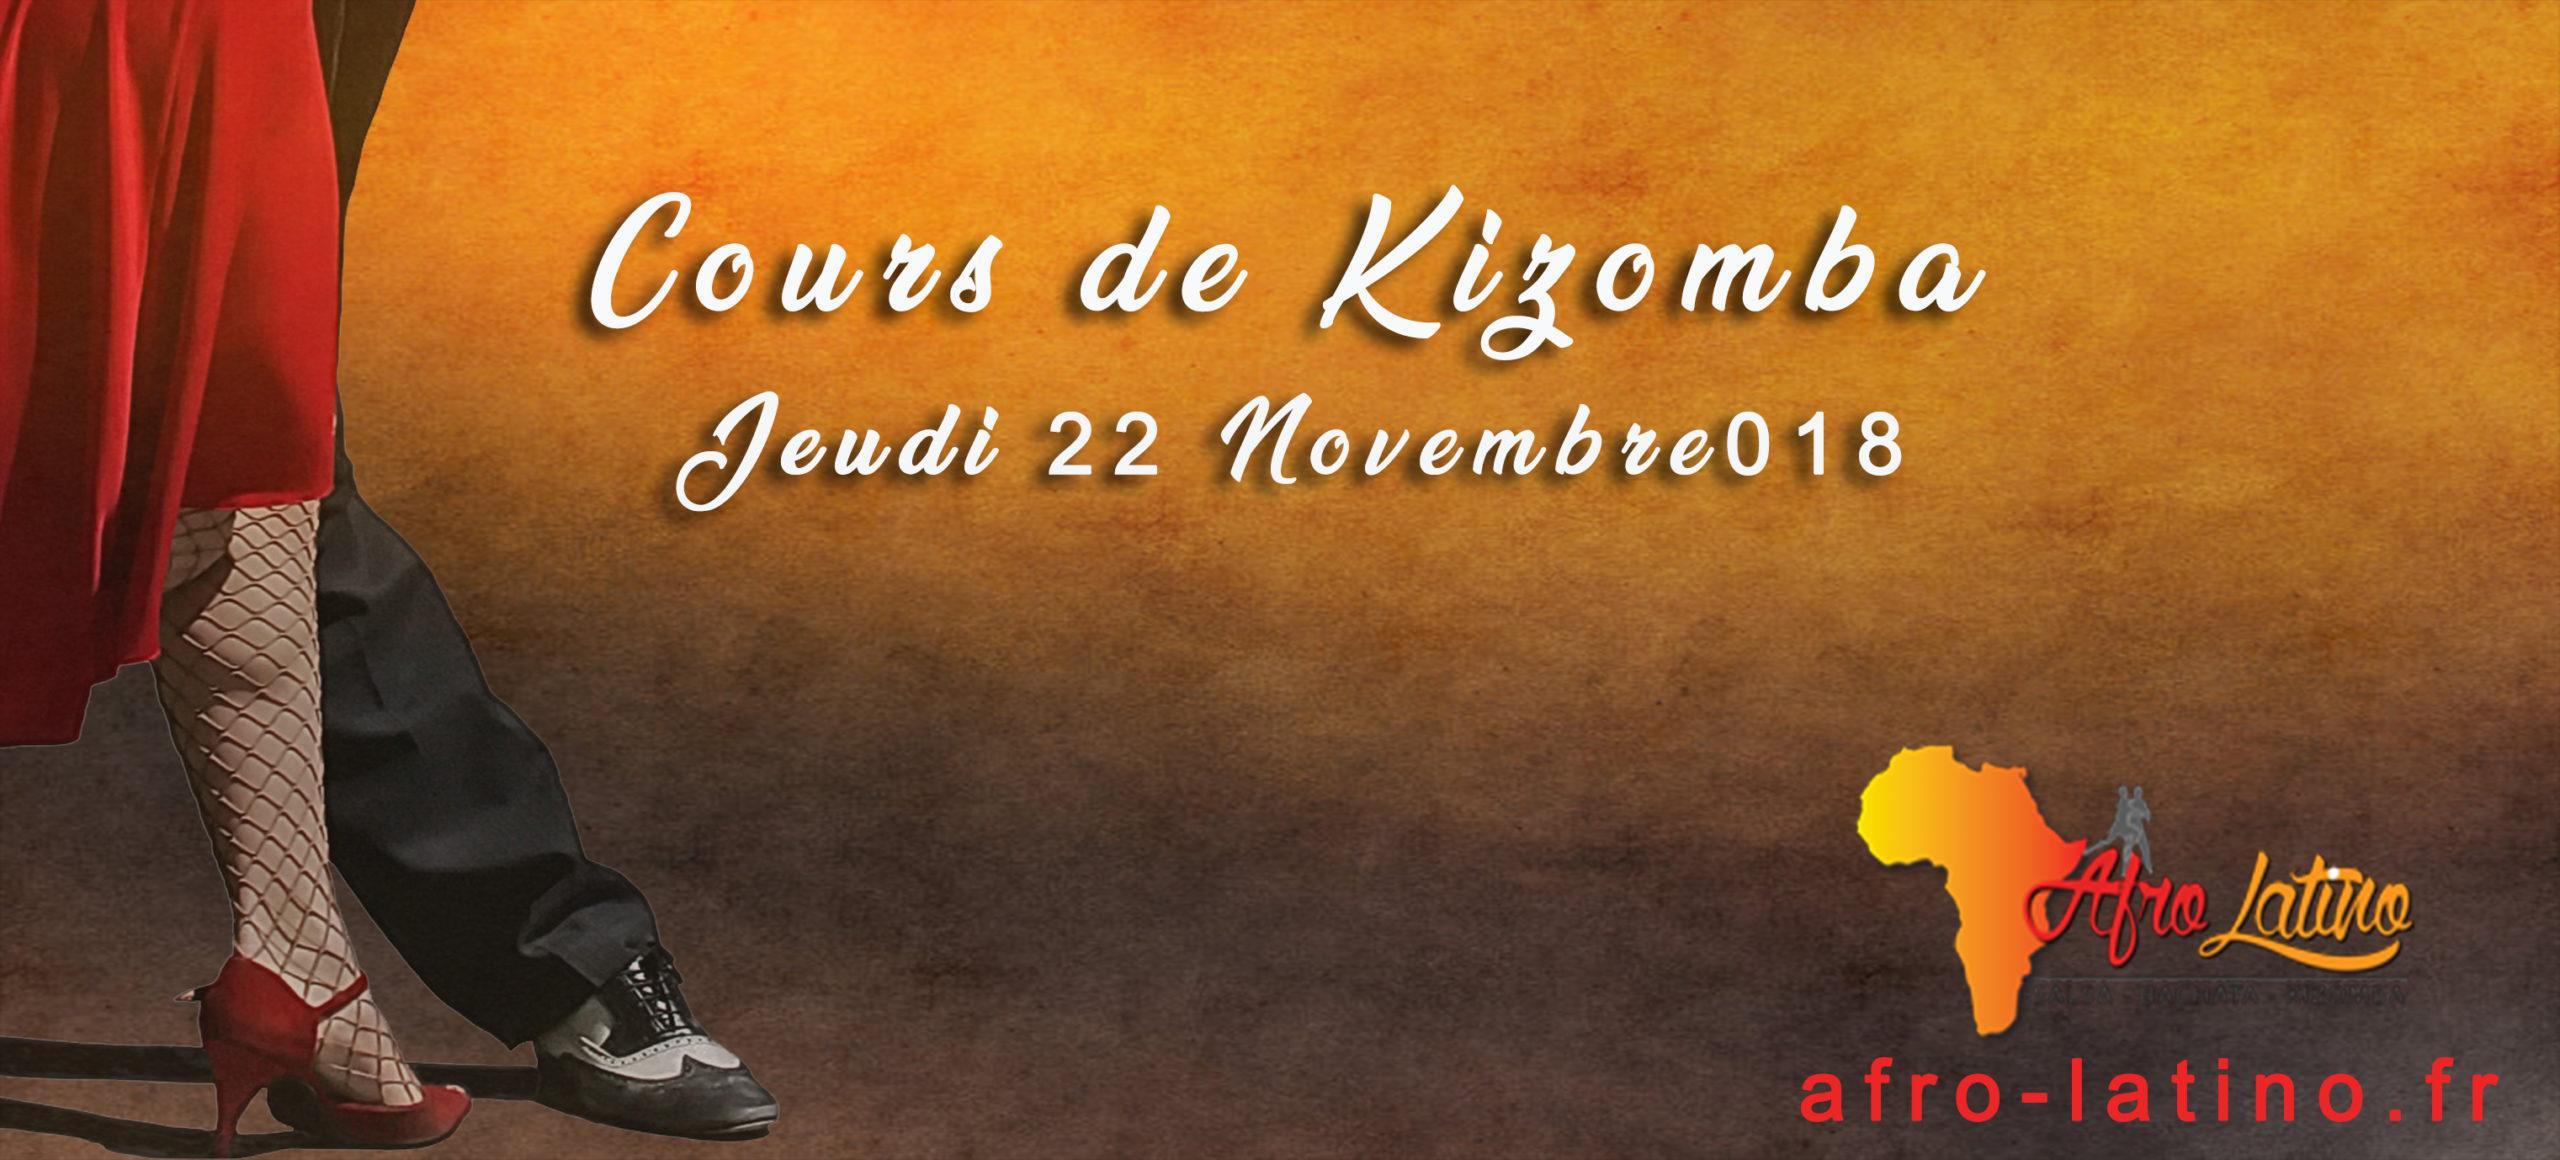 Cours de kizomba le 22 novembre 2018/2019!!!